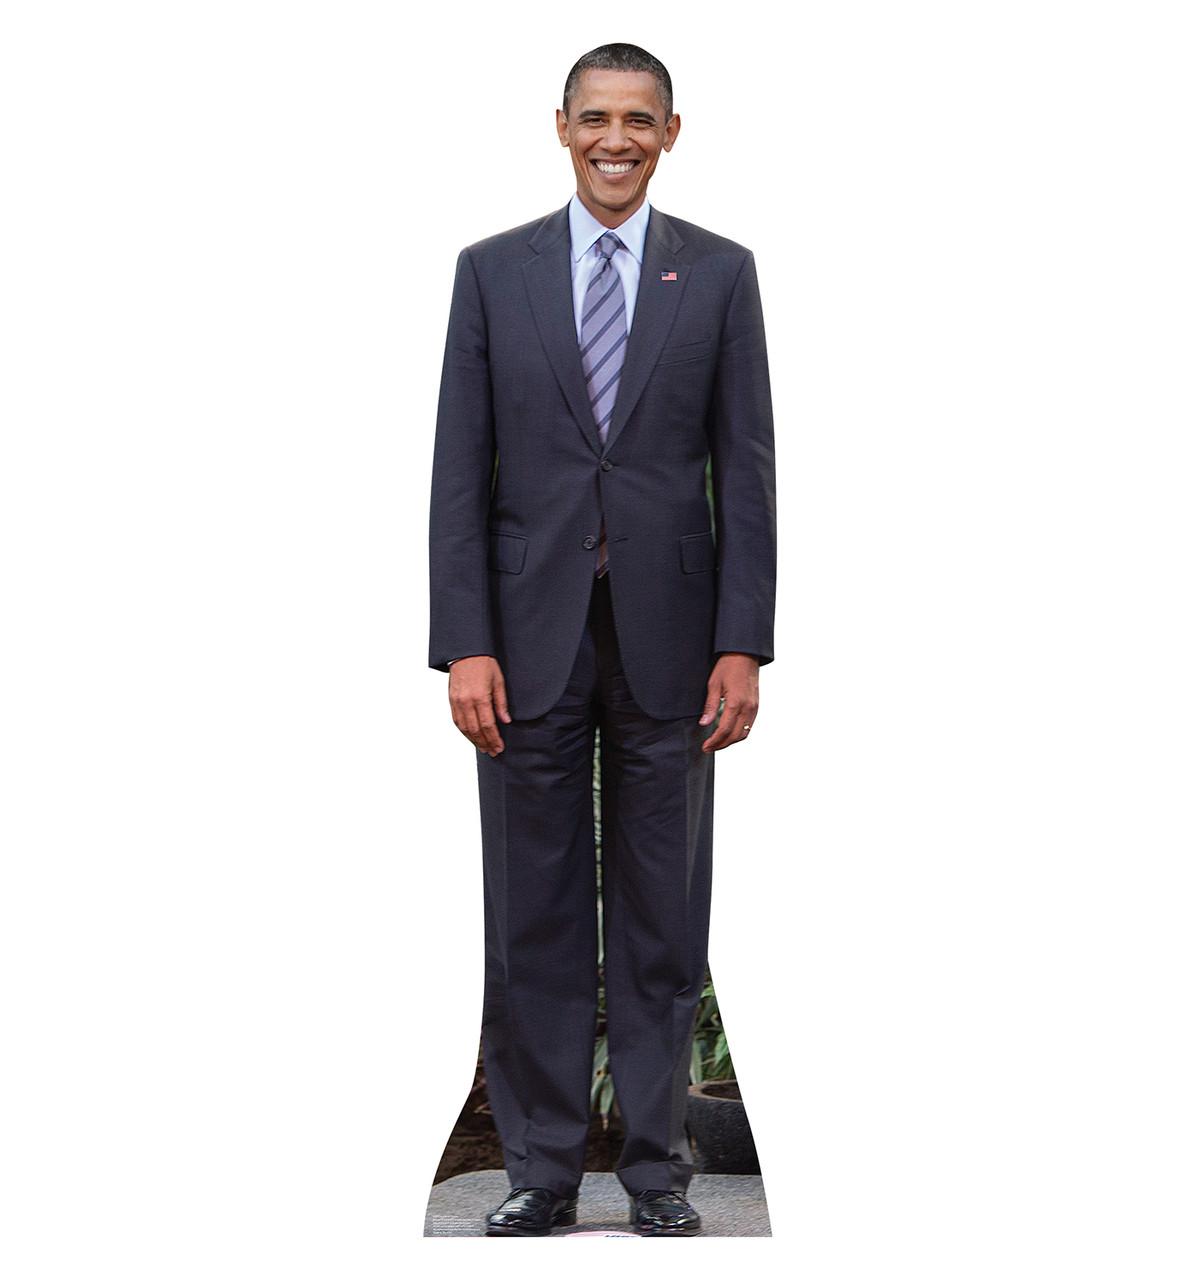 DONALD TRUMP President Lifesize Outdoor Cutout Standups Standee Life Size